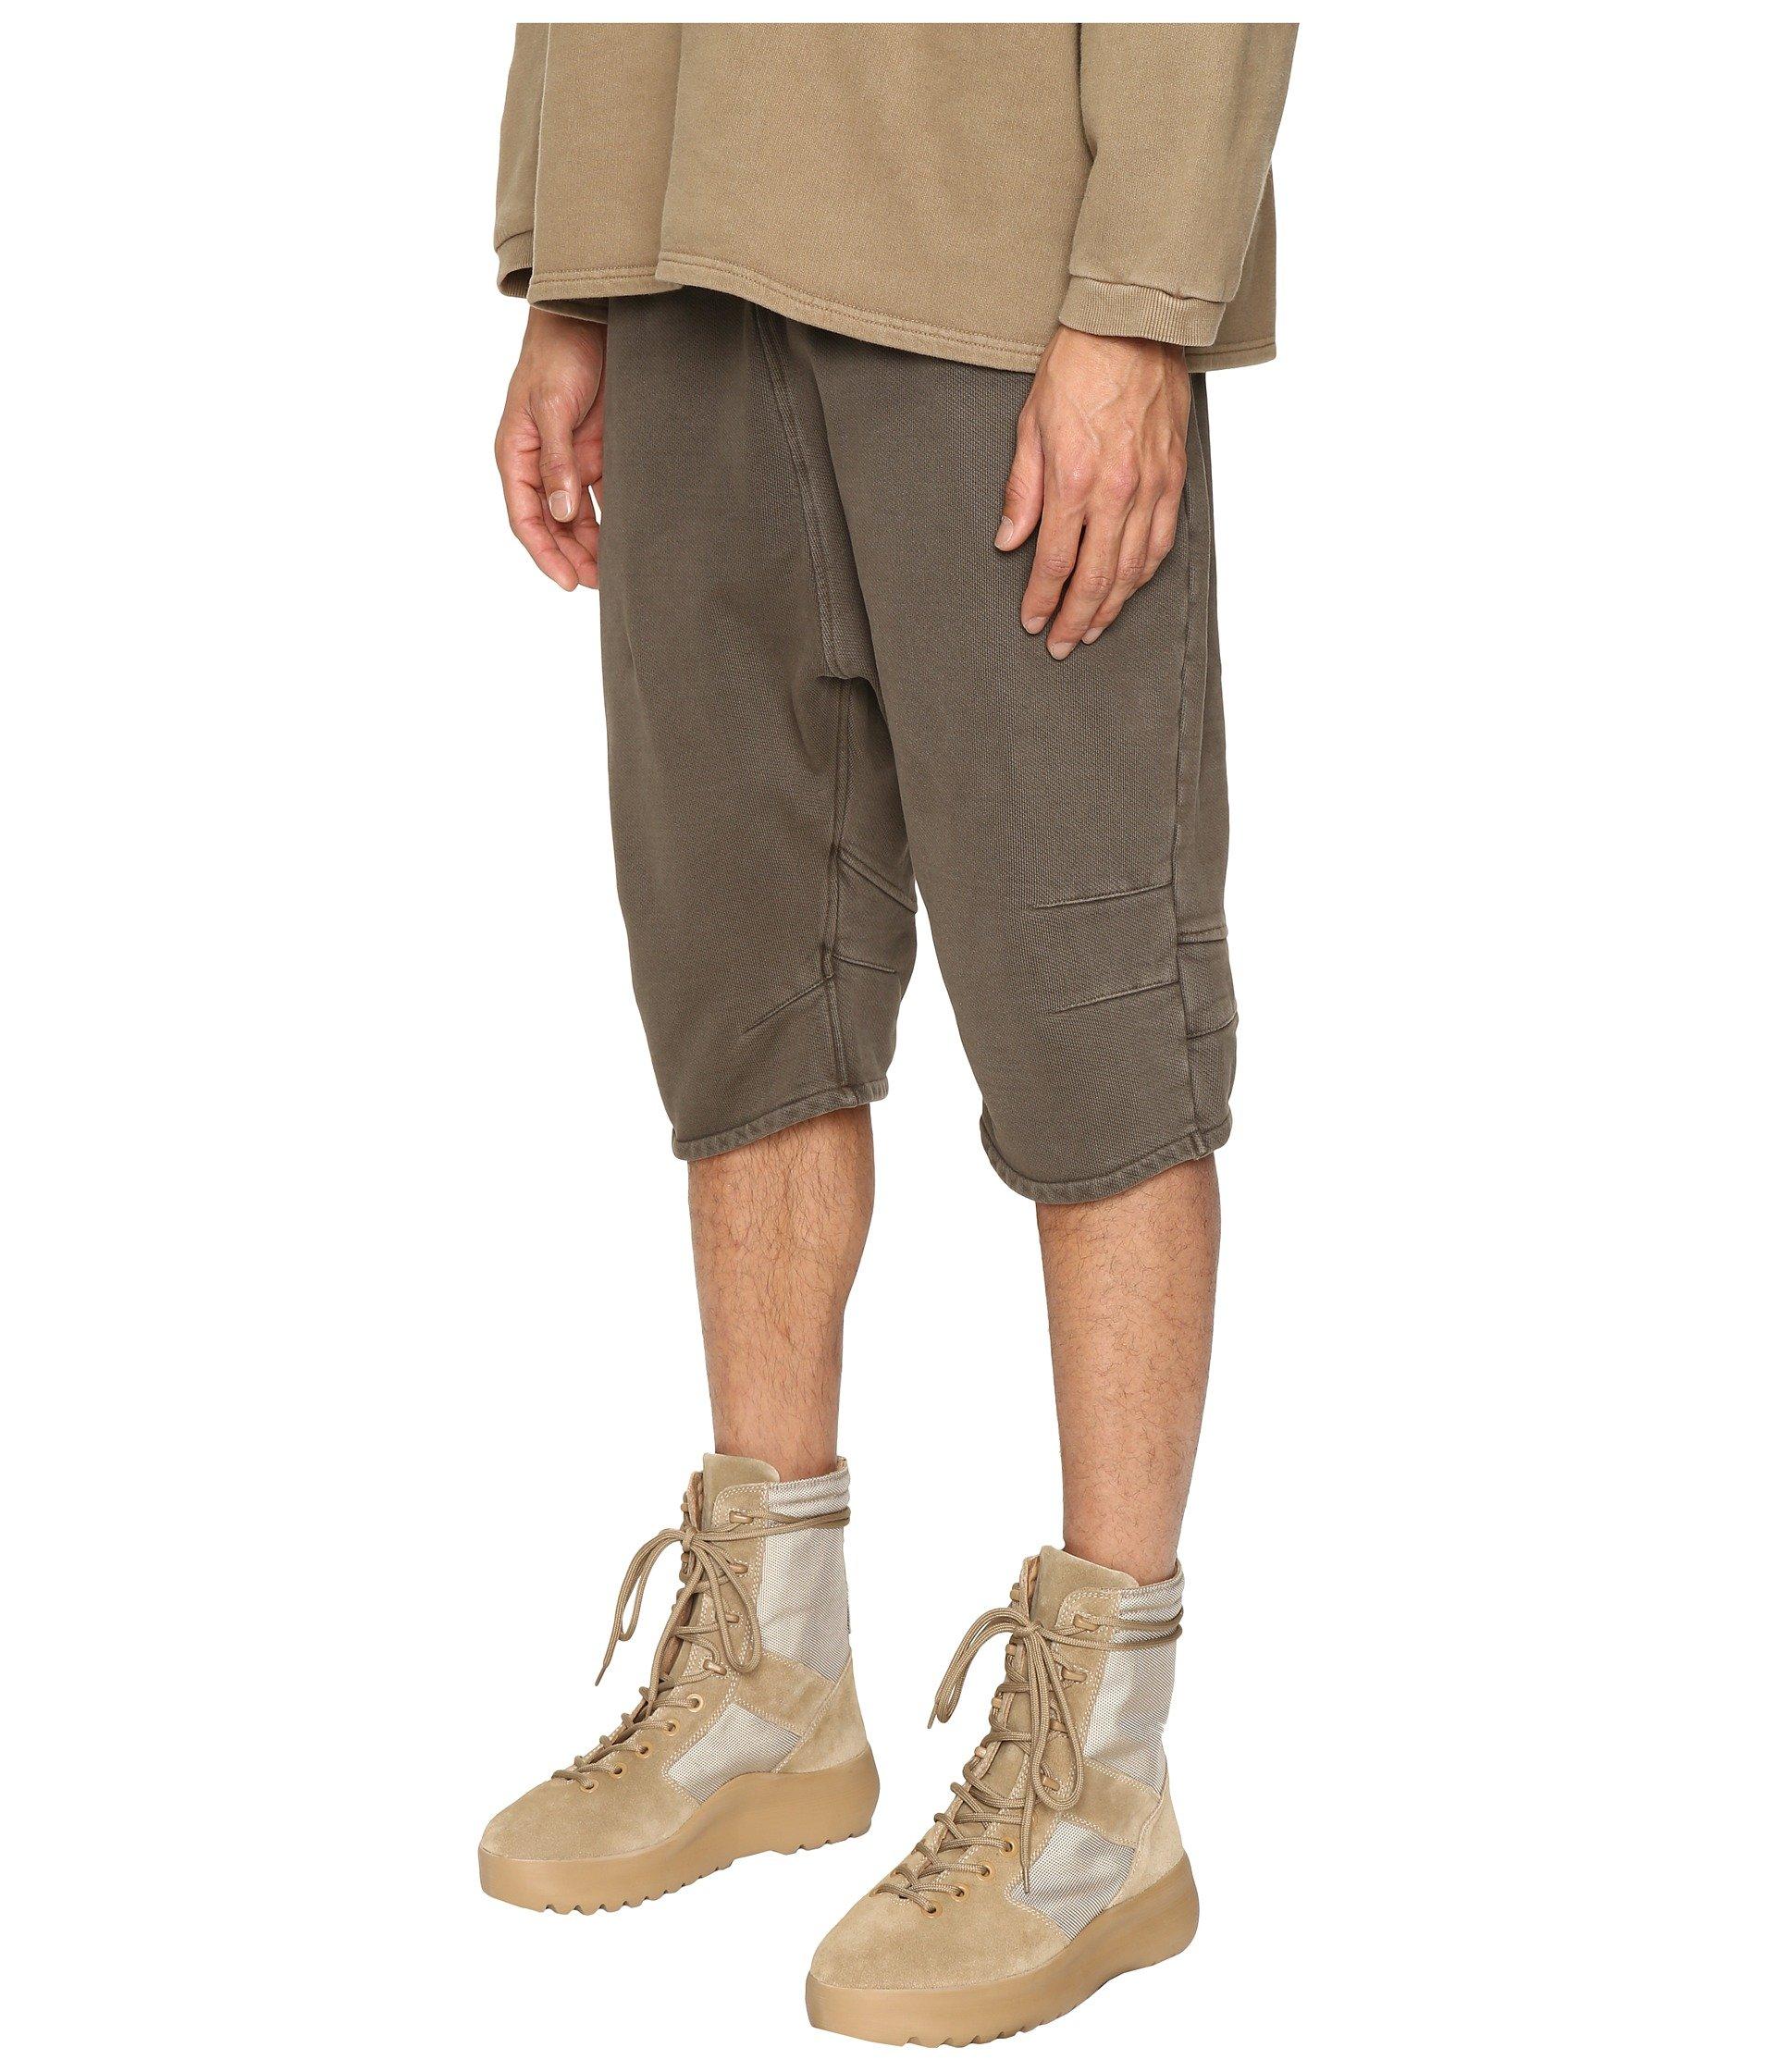 adidas originals by kanye west yeezy season 1 fj shorts at 6pm